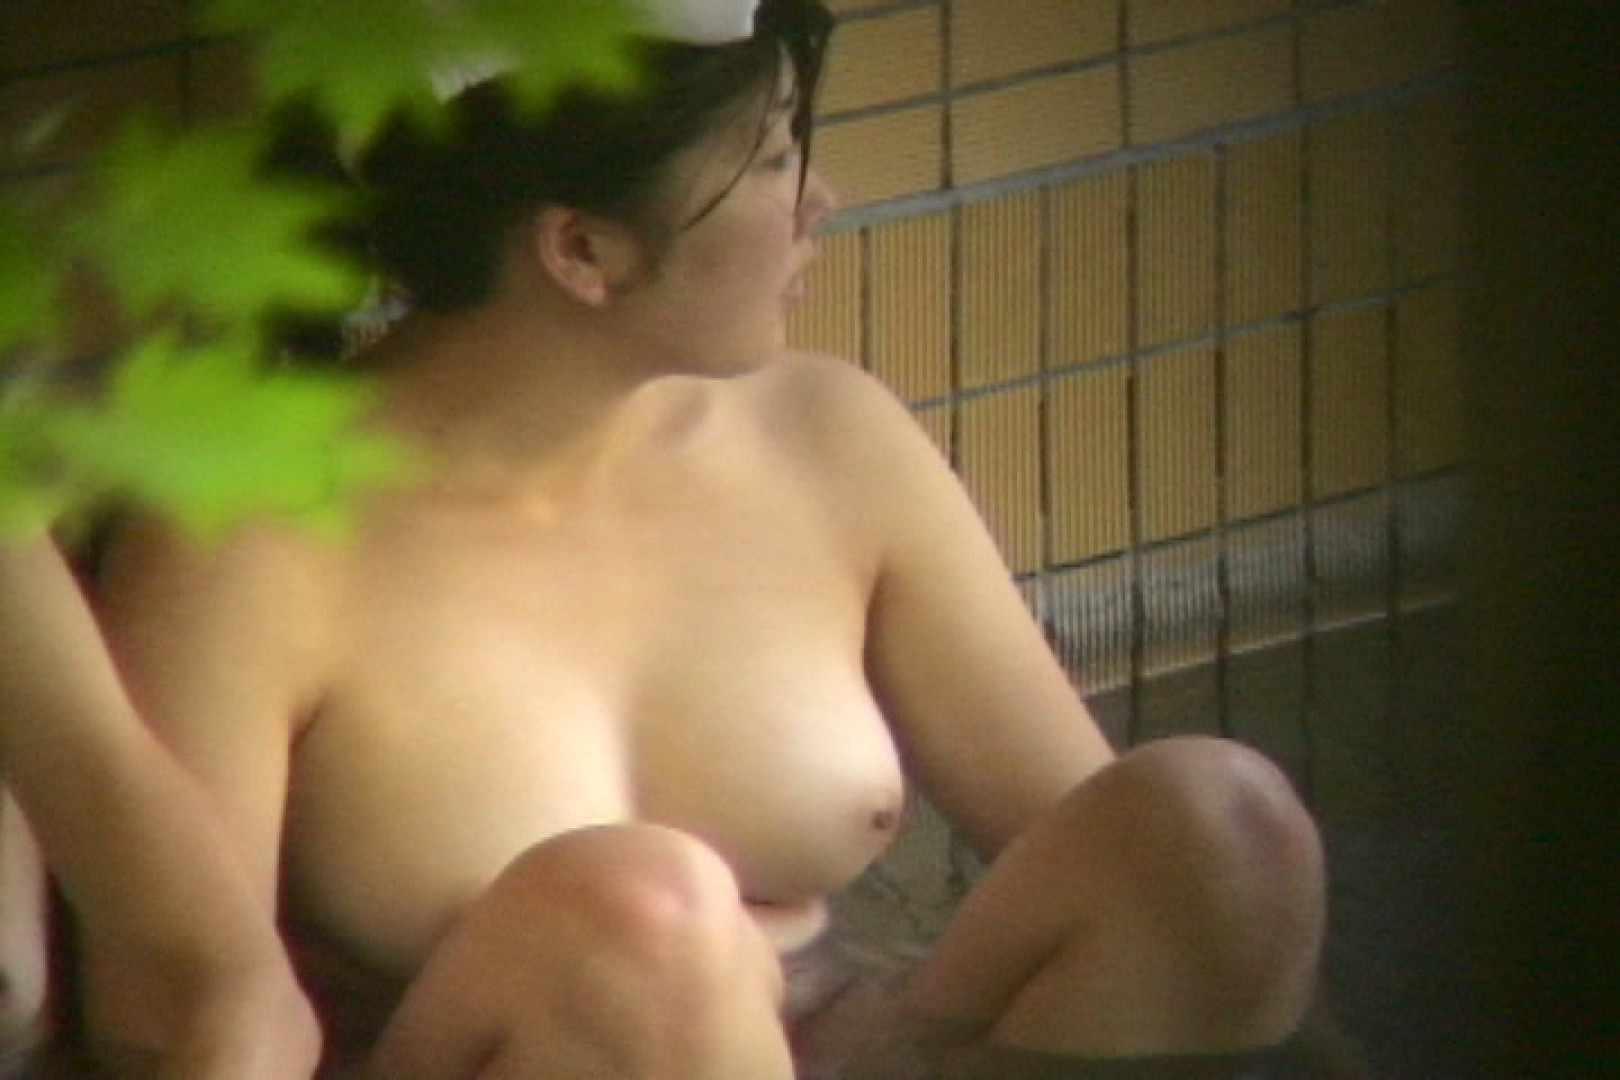 Aquaな露天風呂Vol.704 盗撮師作品   露天風呂突入  75pic 64